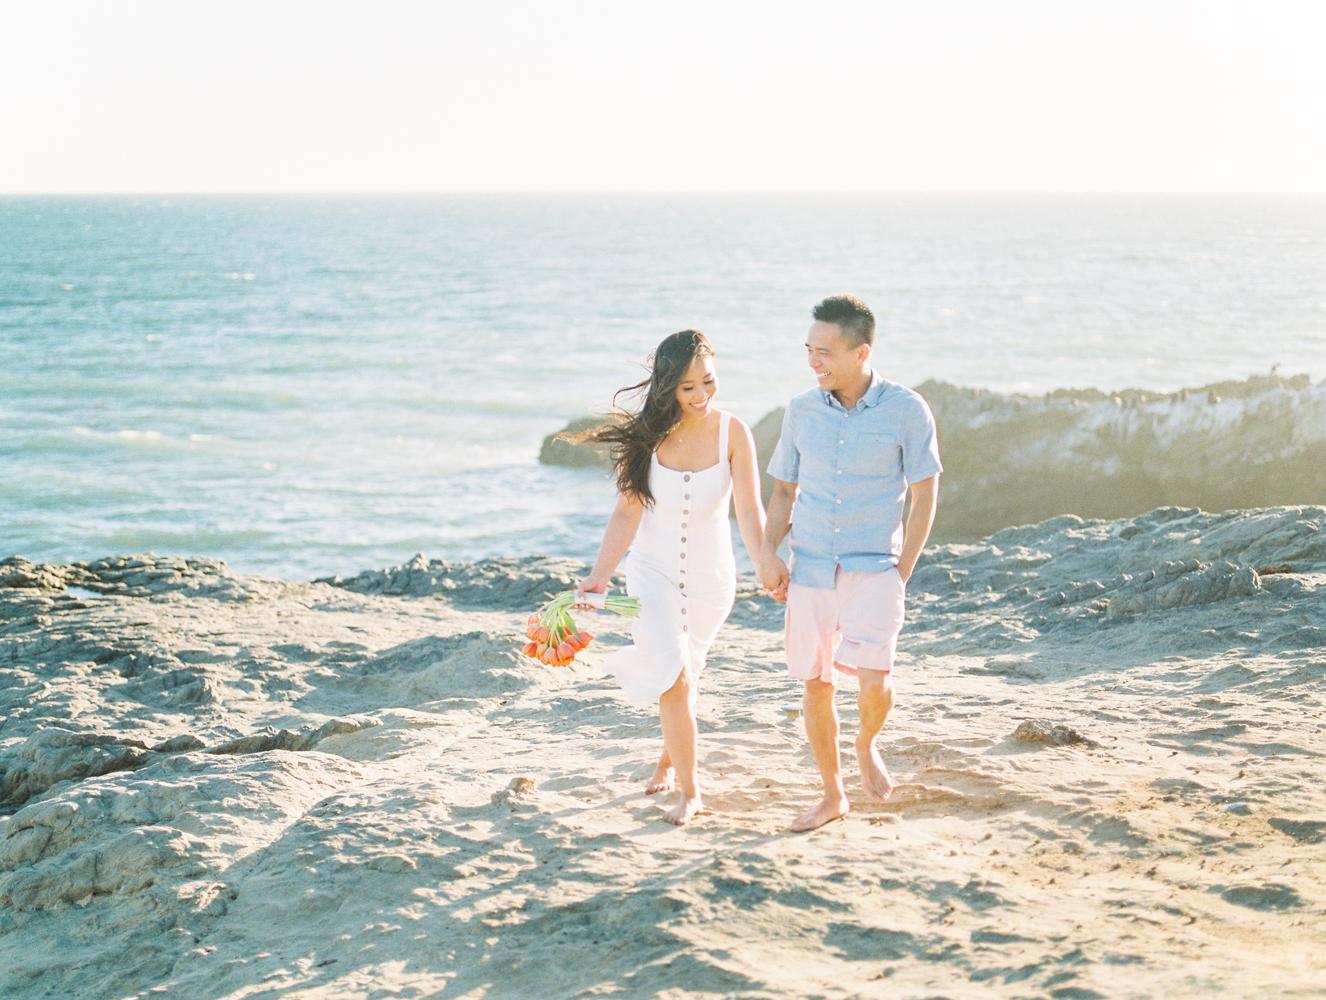 Leo_Carillo_Beach_Malibu_Engagement_Session_Anya_Kernes-6.jpg